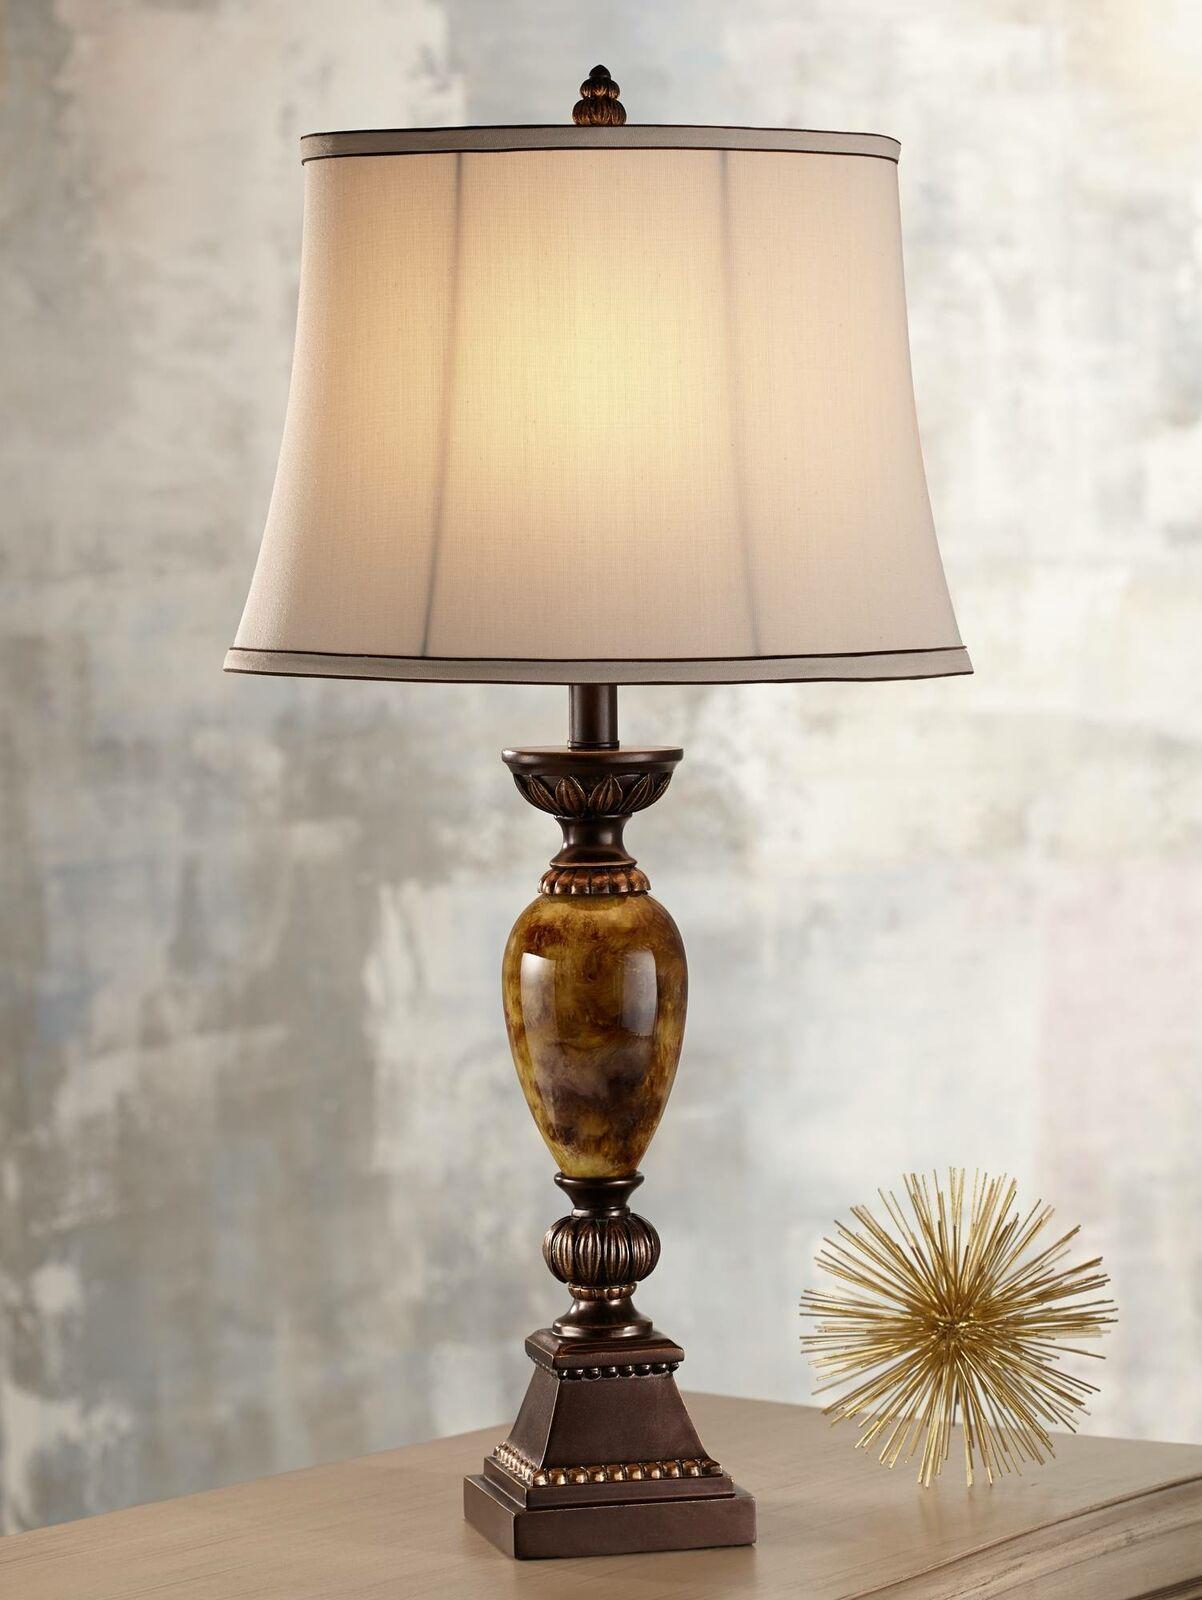 Charlton Home Kayley 30 Table Lamp For Sale Online Ebay